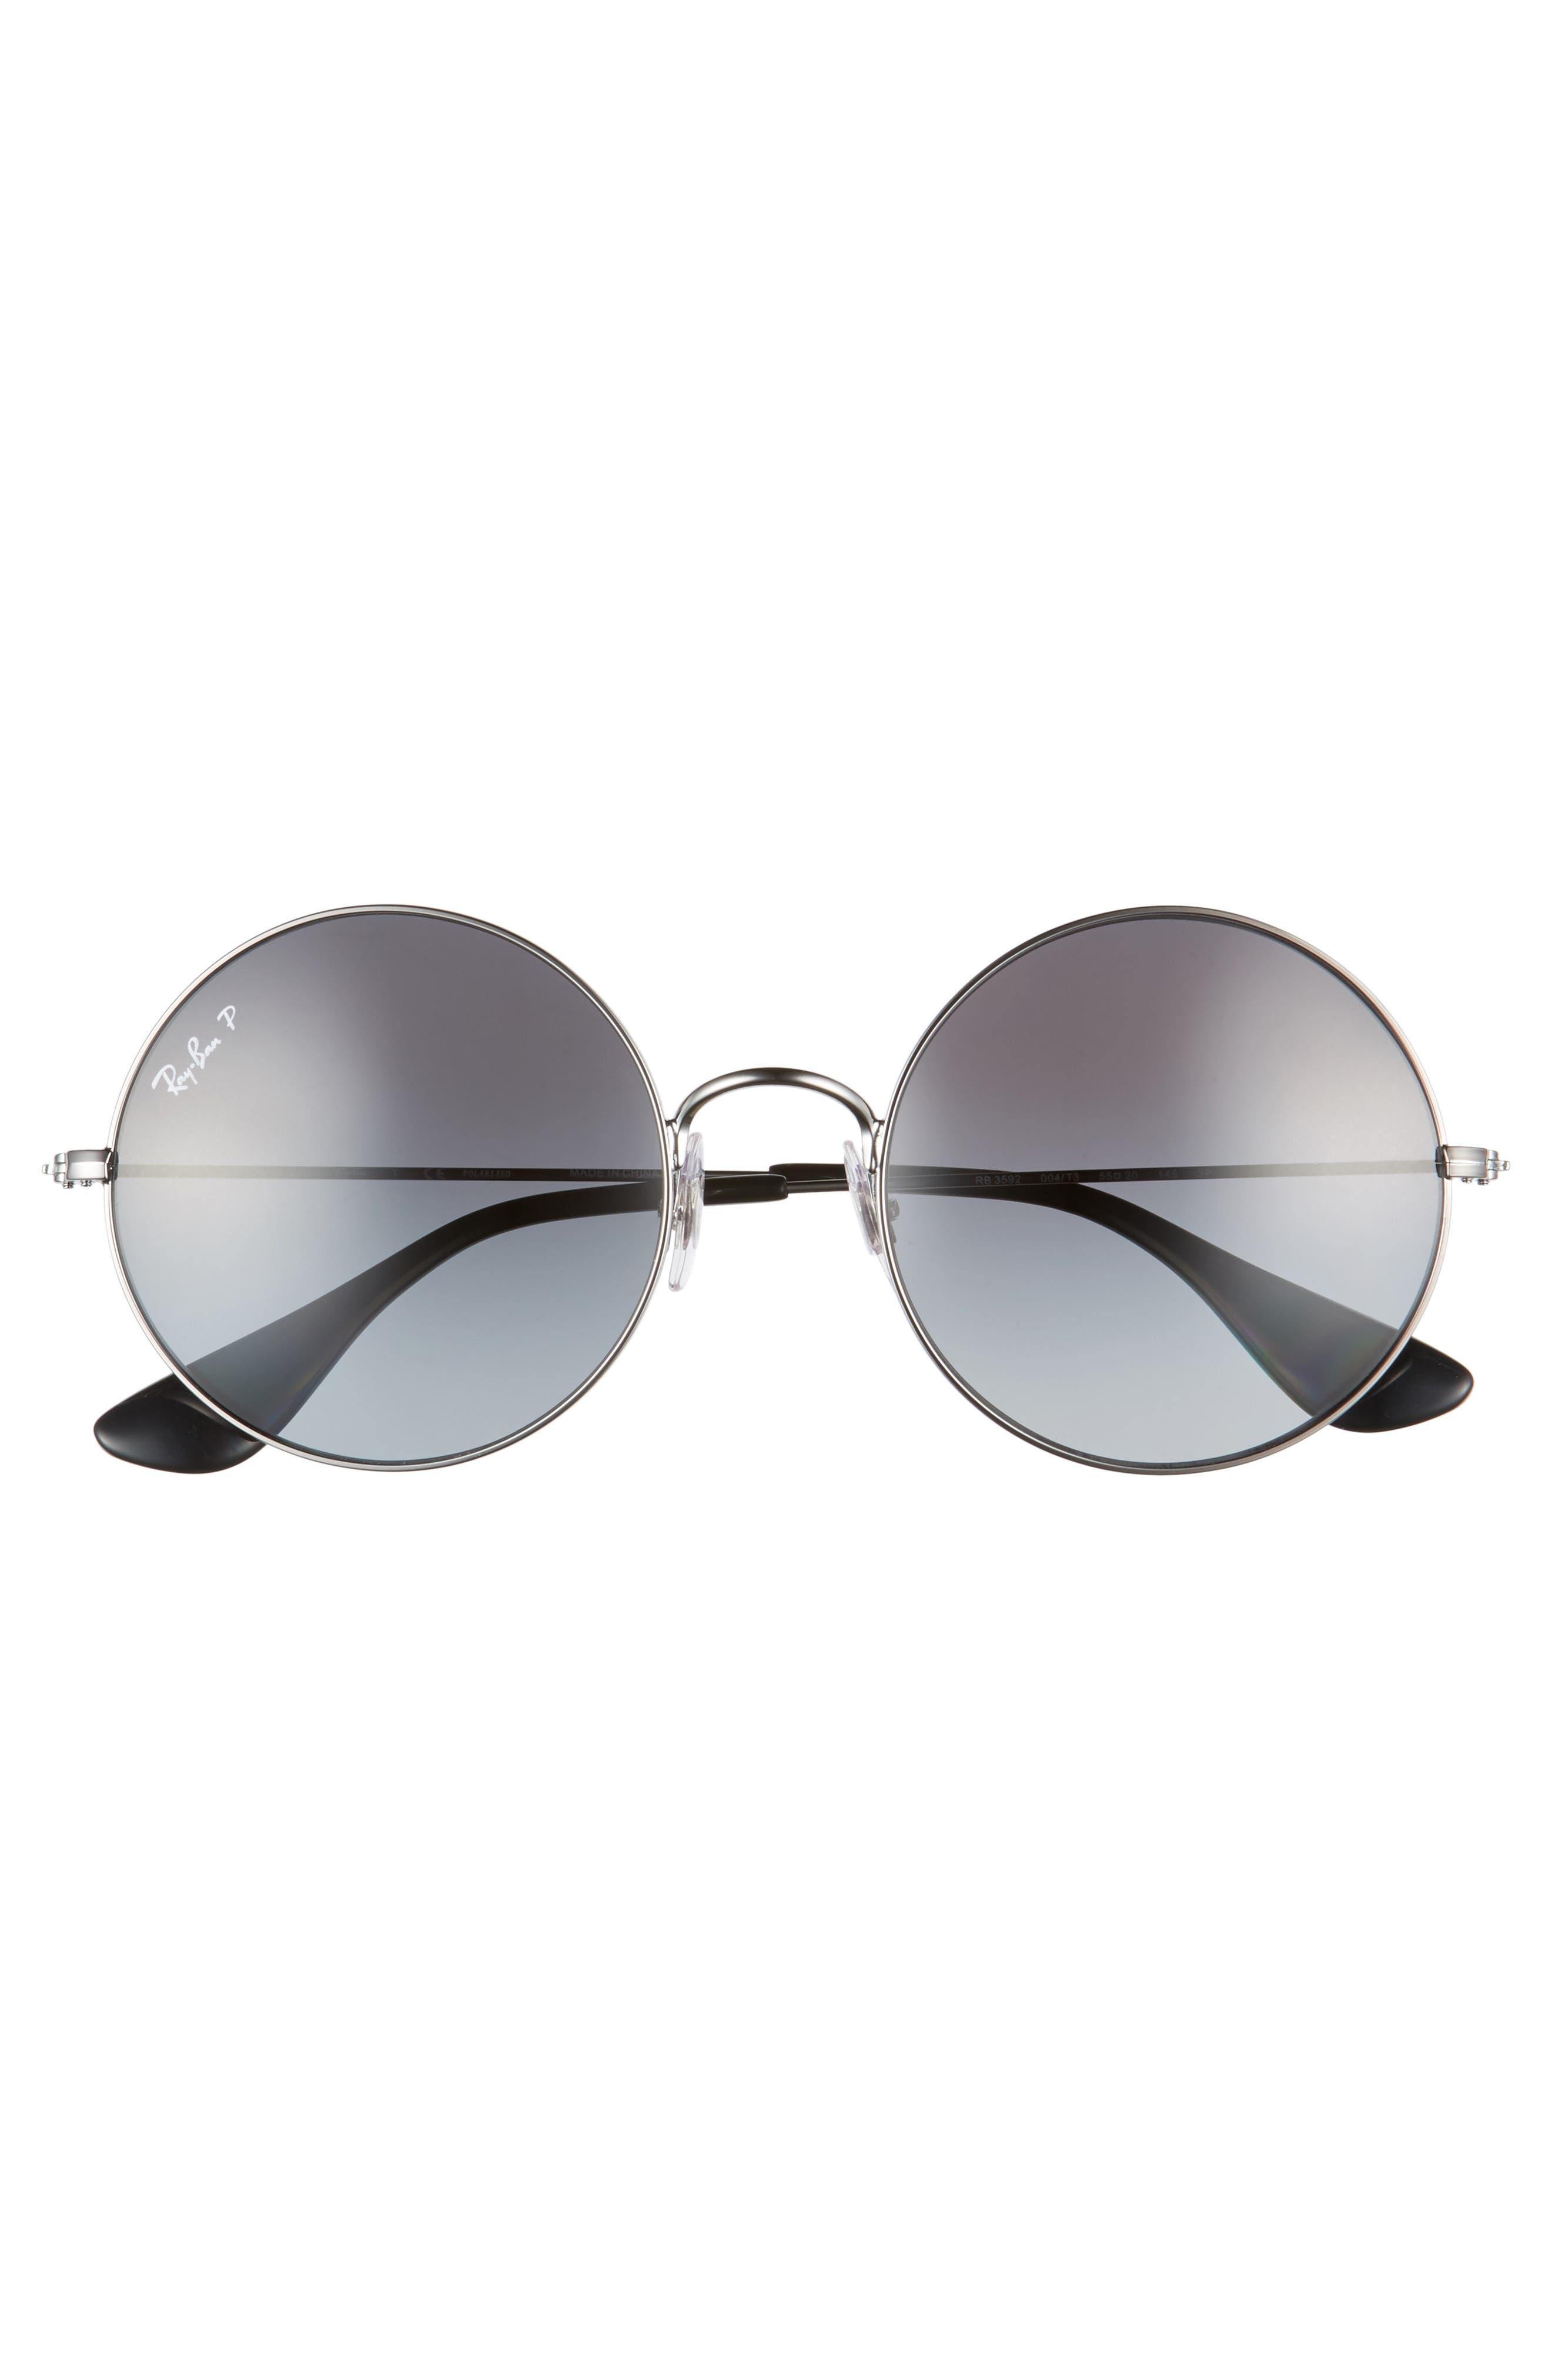 55mm Polarized Round Sunglasses,                             Alternate thumbnail 5, color,